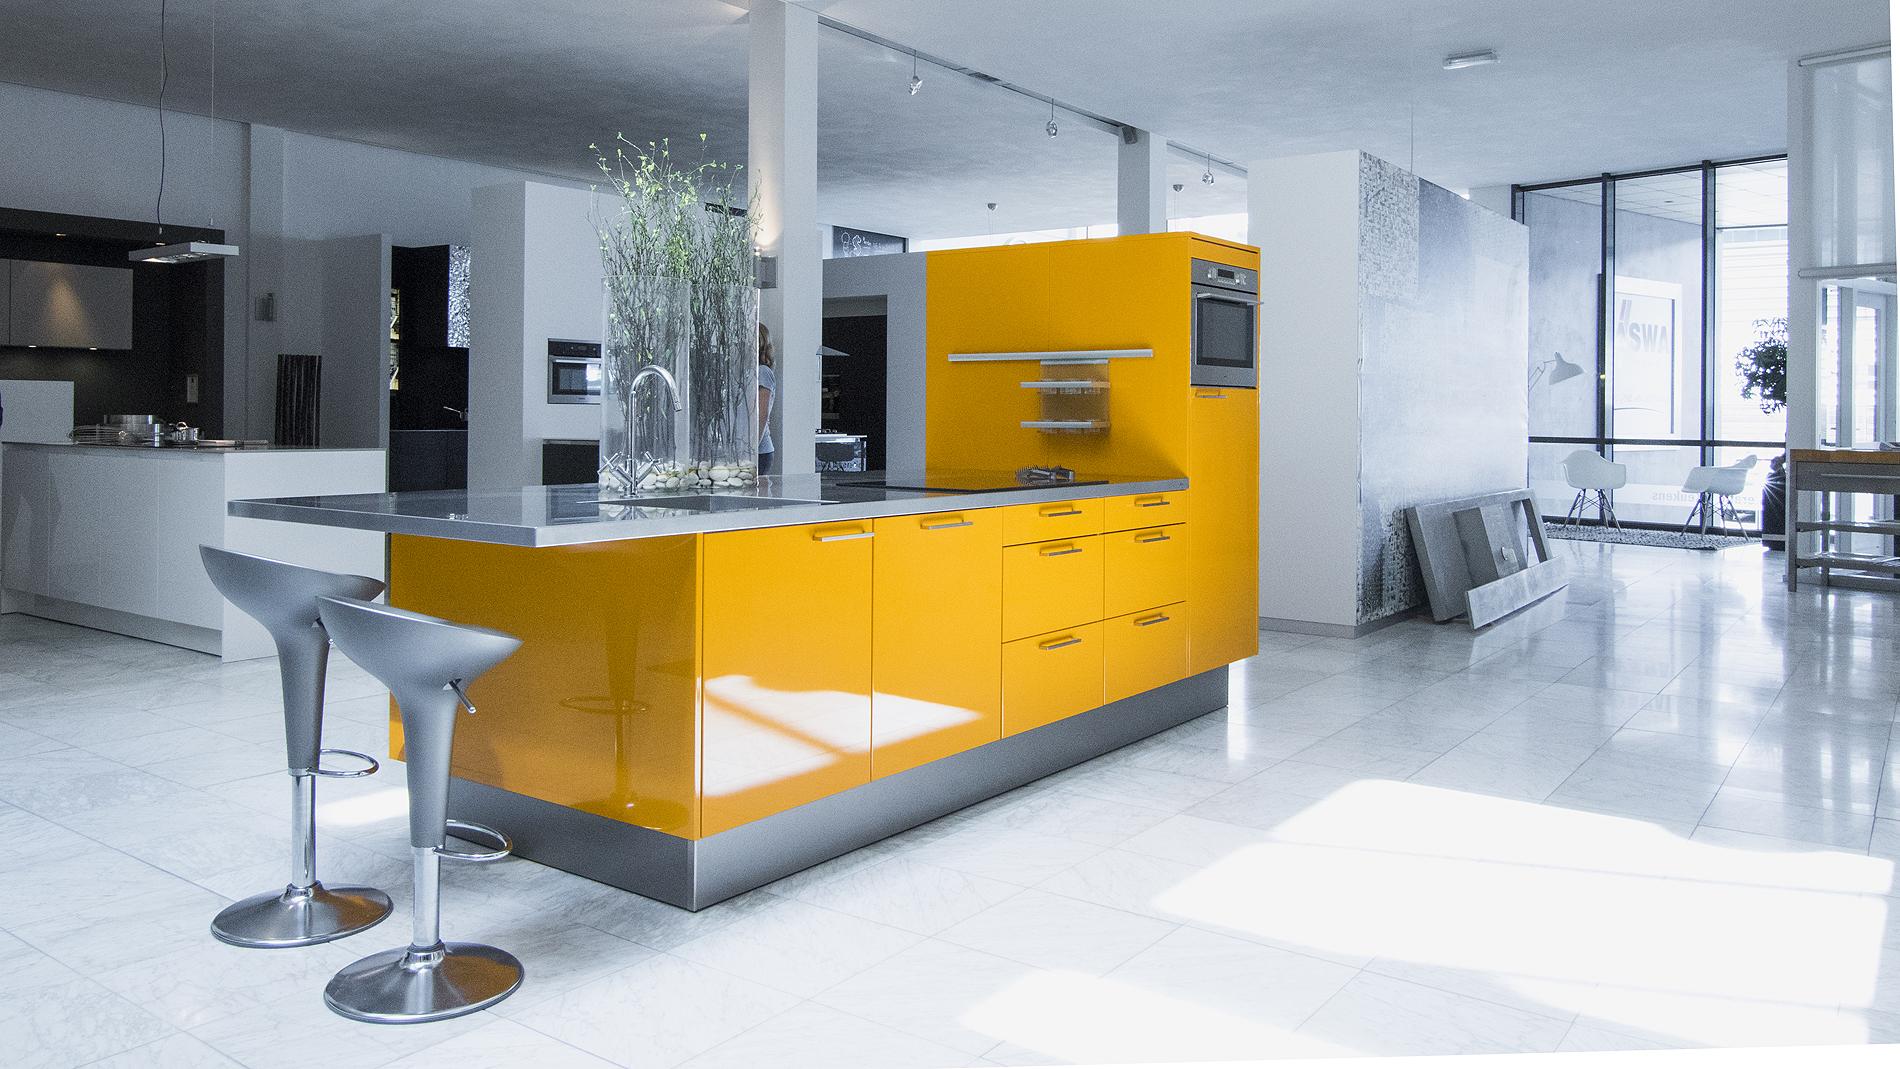 Showroomkeuken siematic sc51   aswa keukens